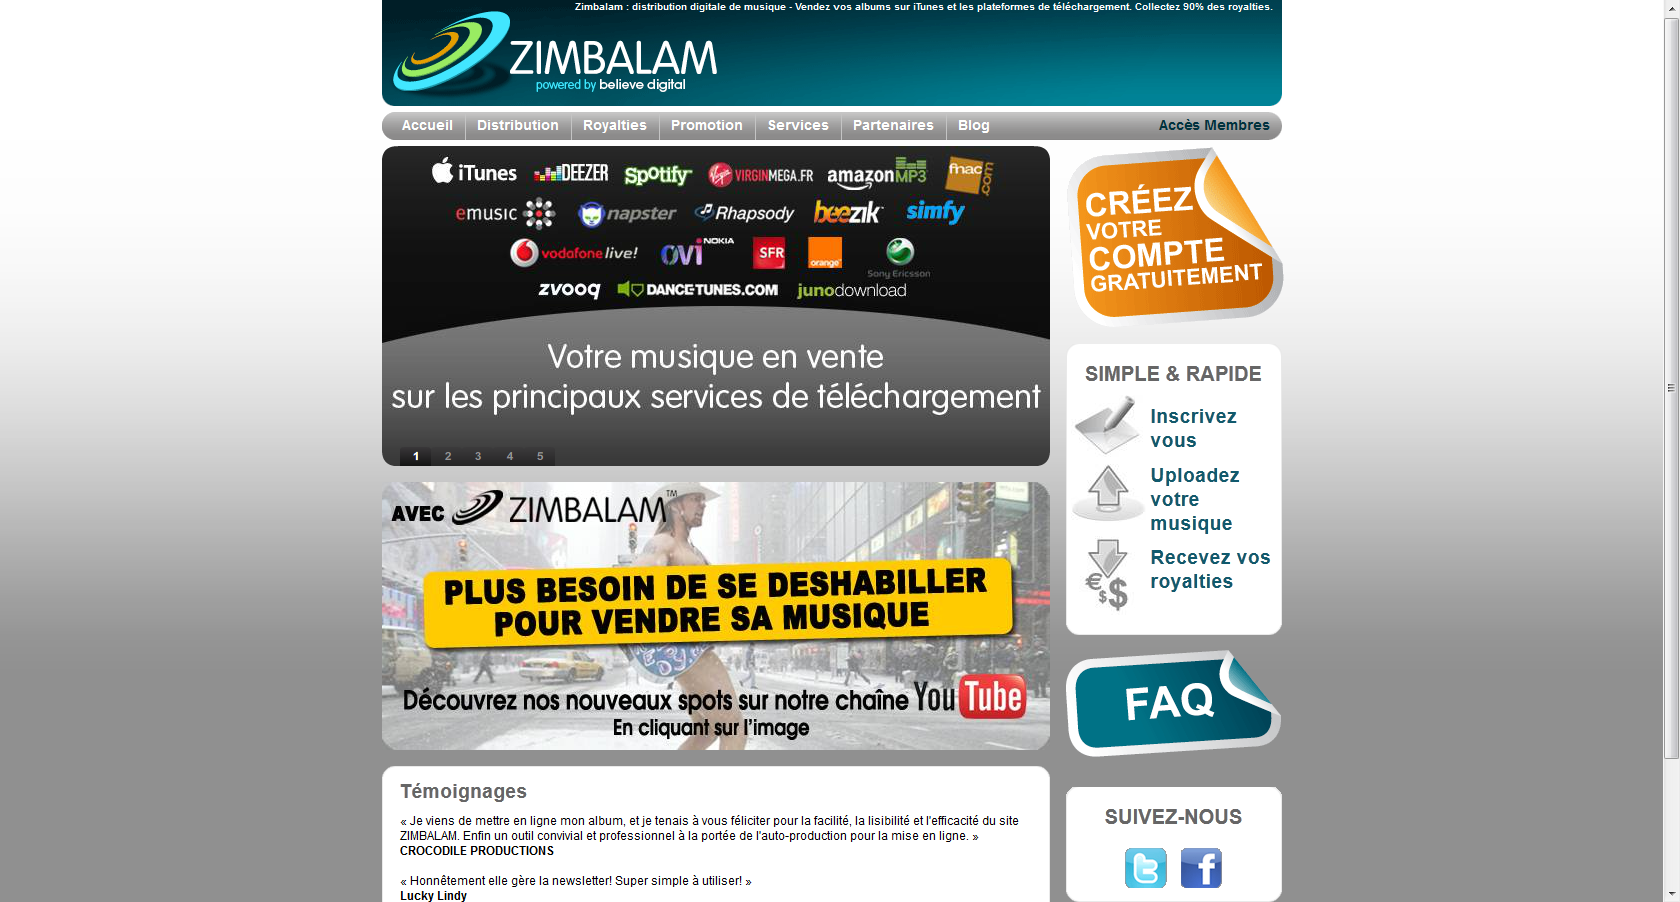 http://nsm07.casimages.com/img/2012/01/28//1201280617051323939360250.png